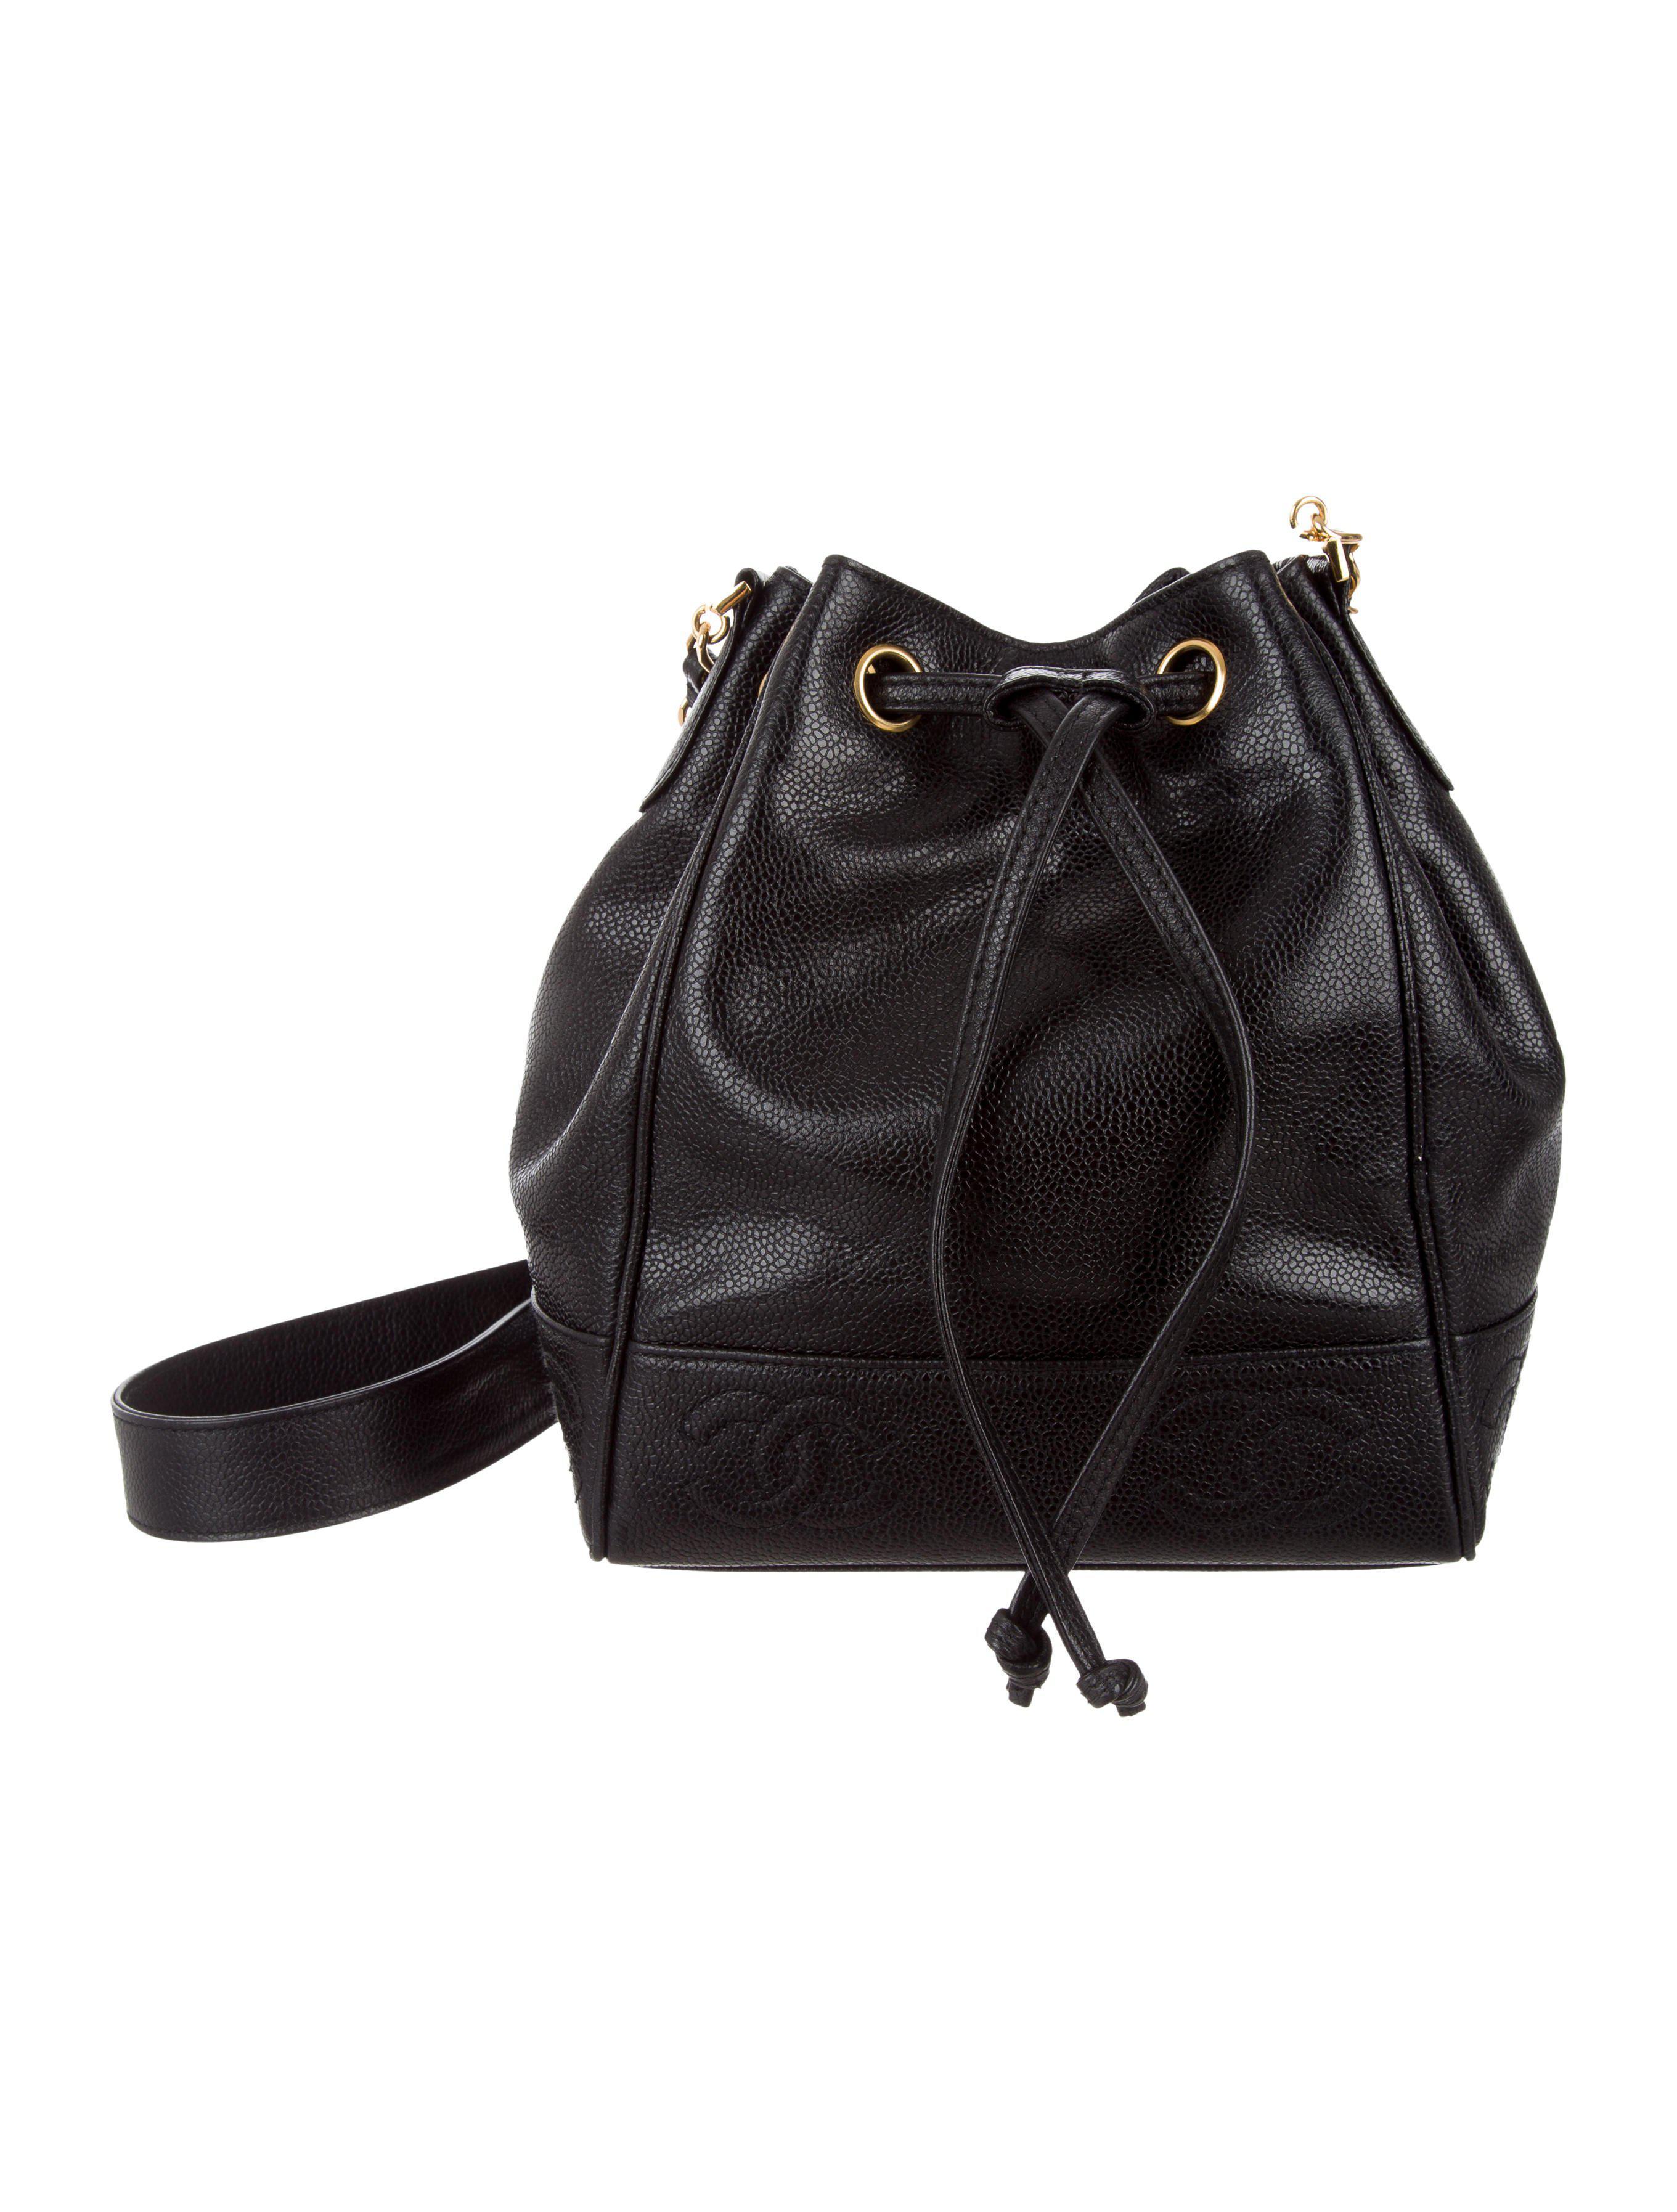 Lyst - Chanel Vintage Drawstring Shoulder Bag Black in Metallic 04aceab5c1878